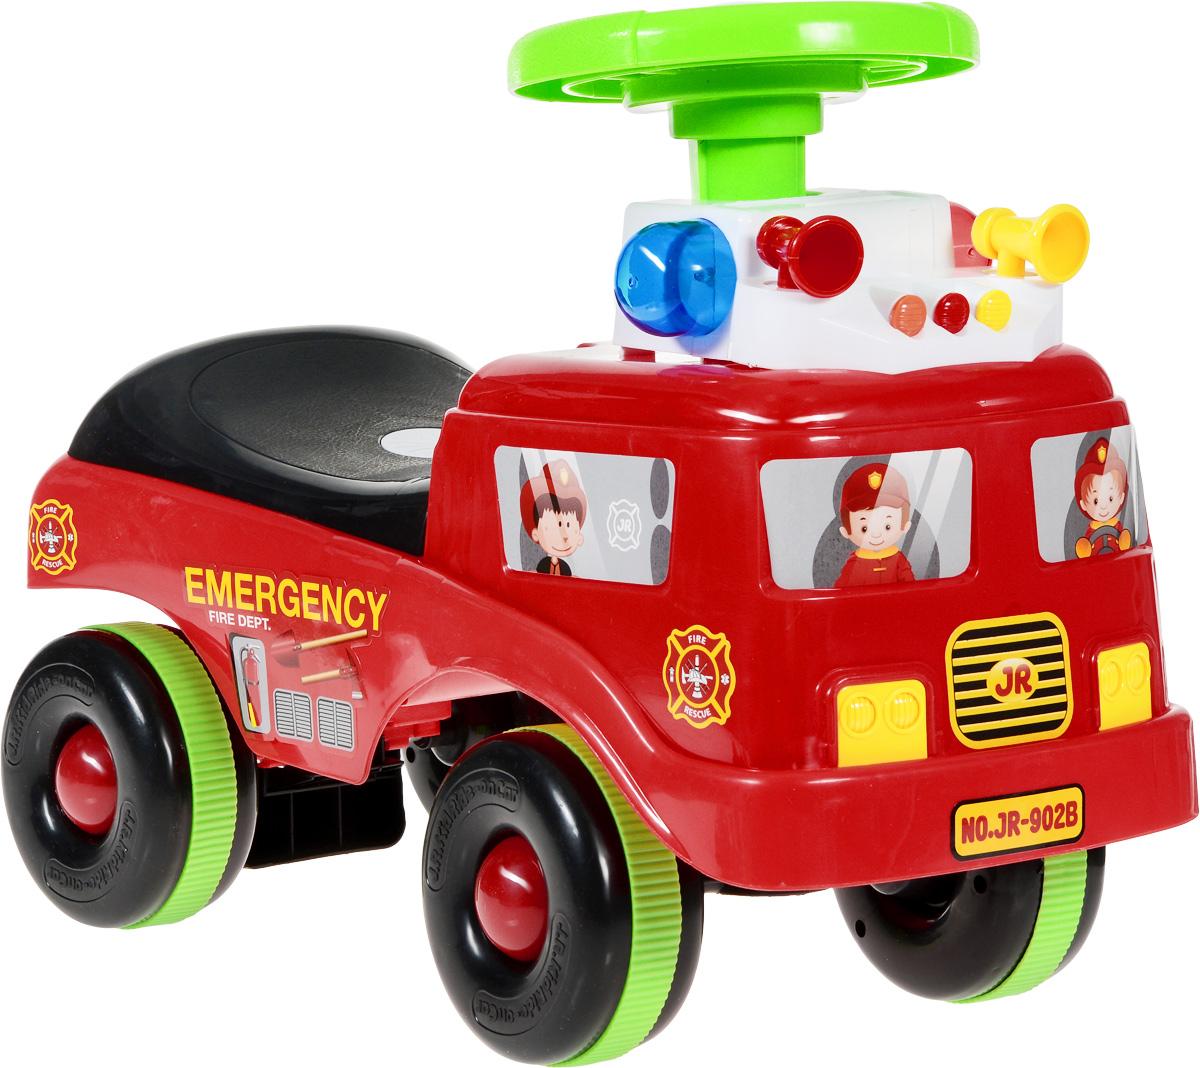 J.R. TOYS Каталка детская Пожарная машина